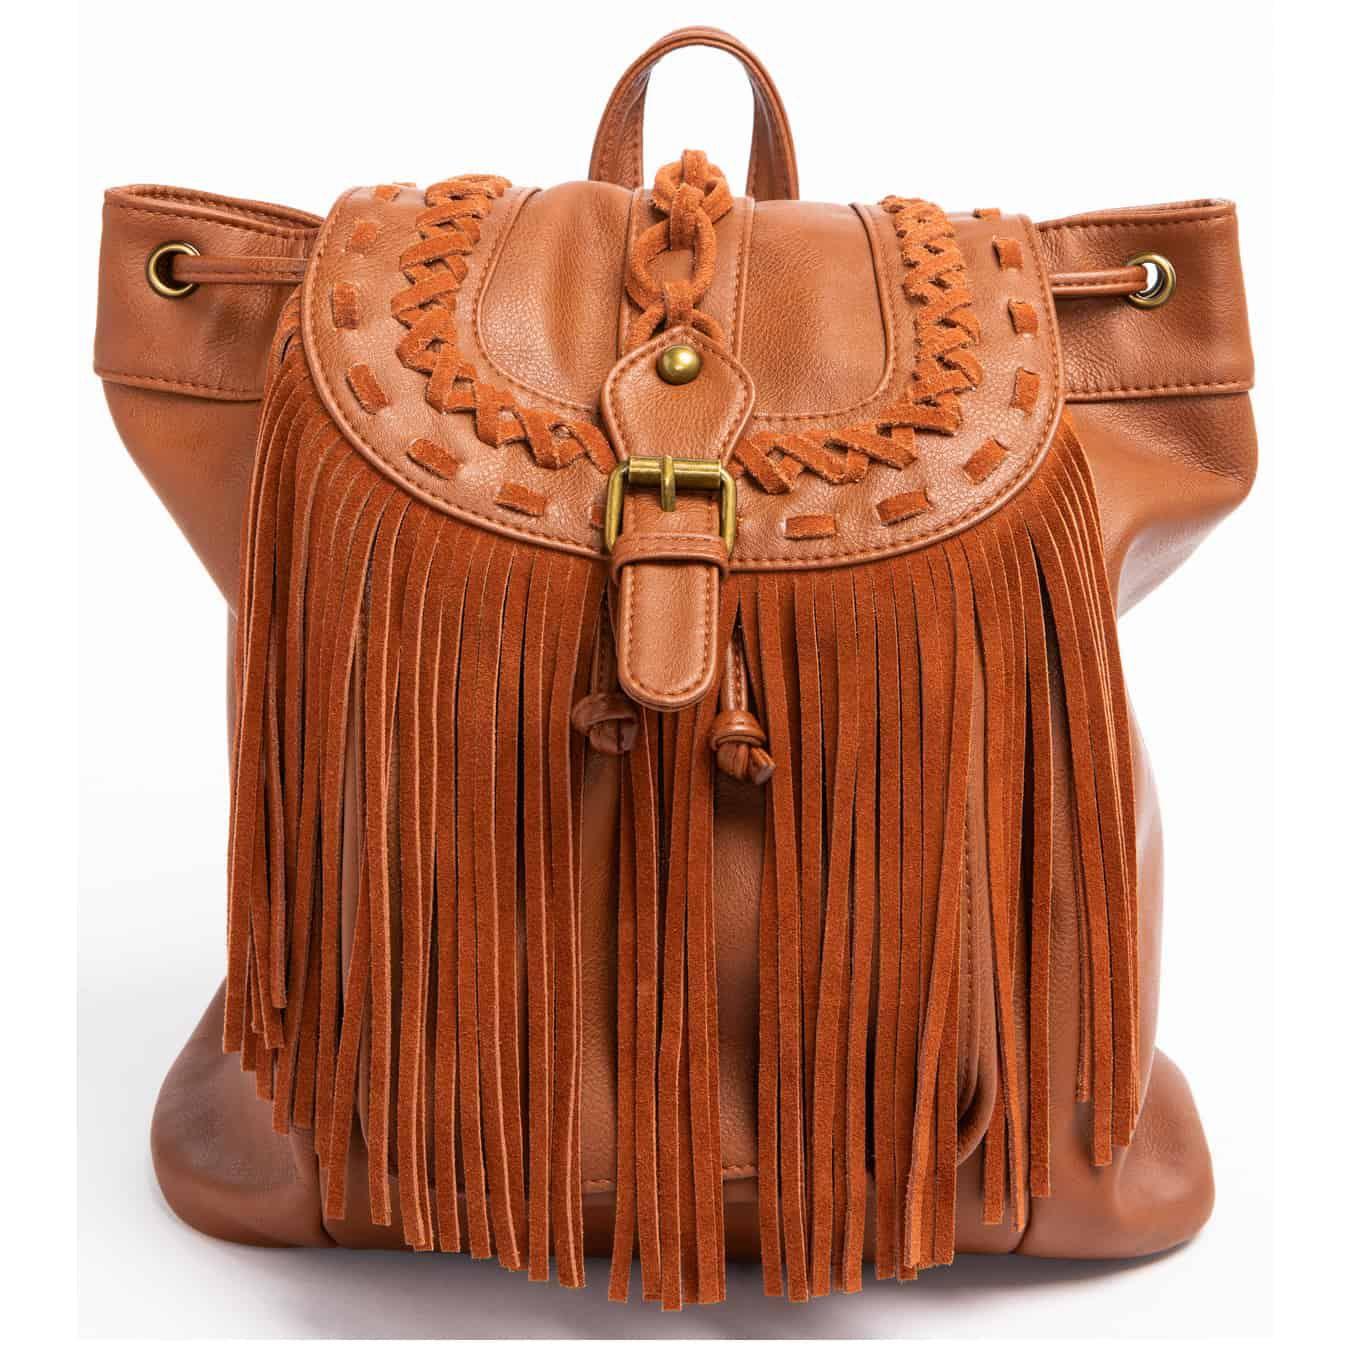 Shyanne Women's Fringe Backpack, $64.99